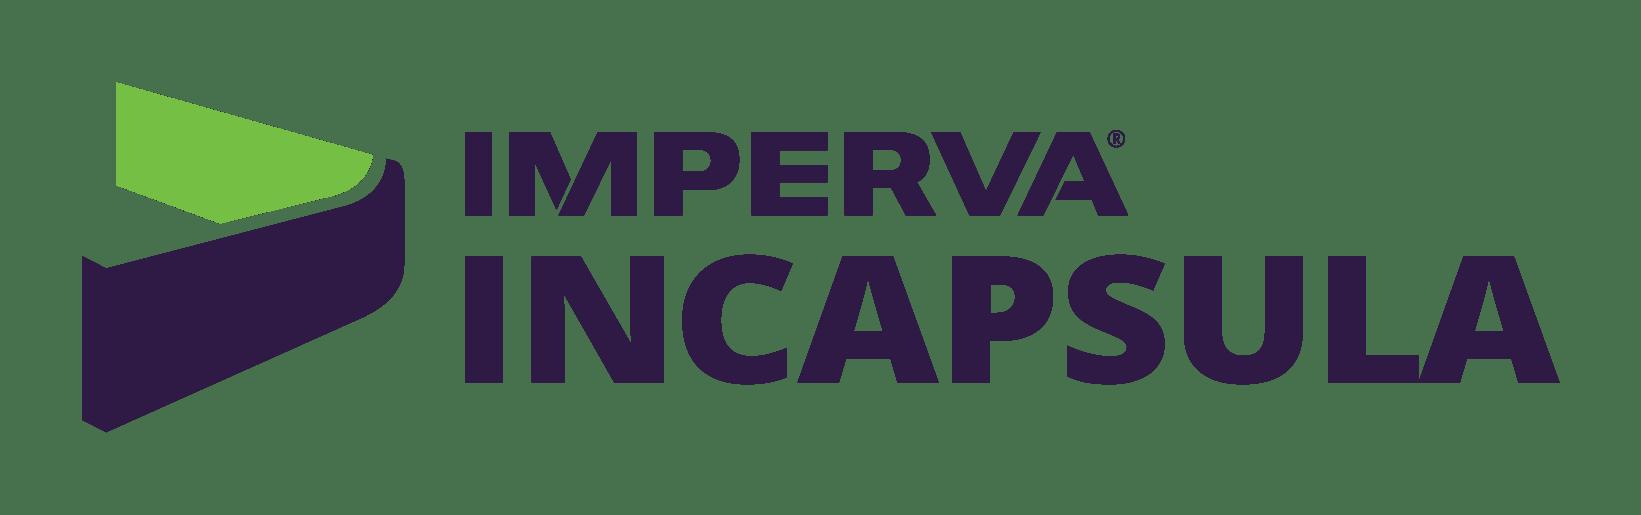 Imperva Incapsula | crunchbase